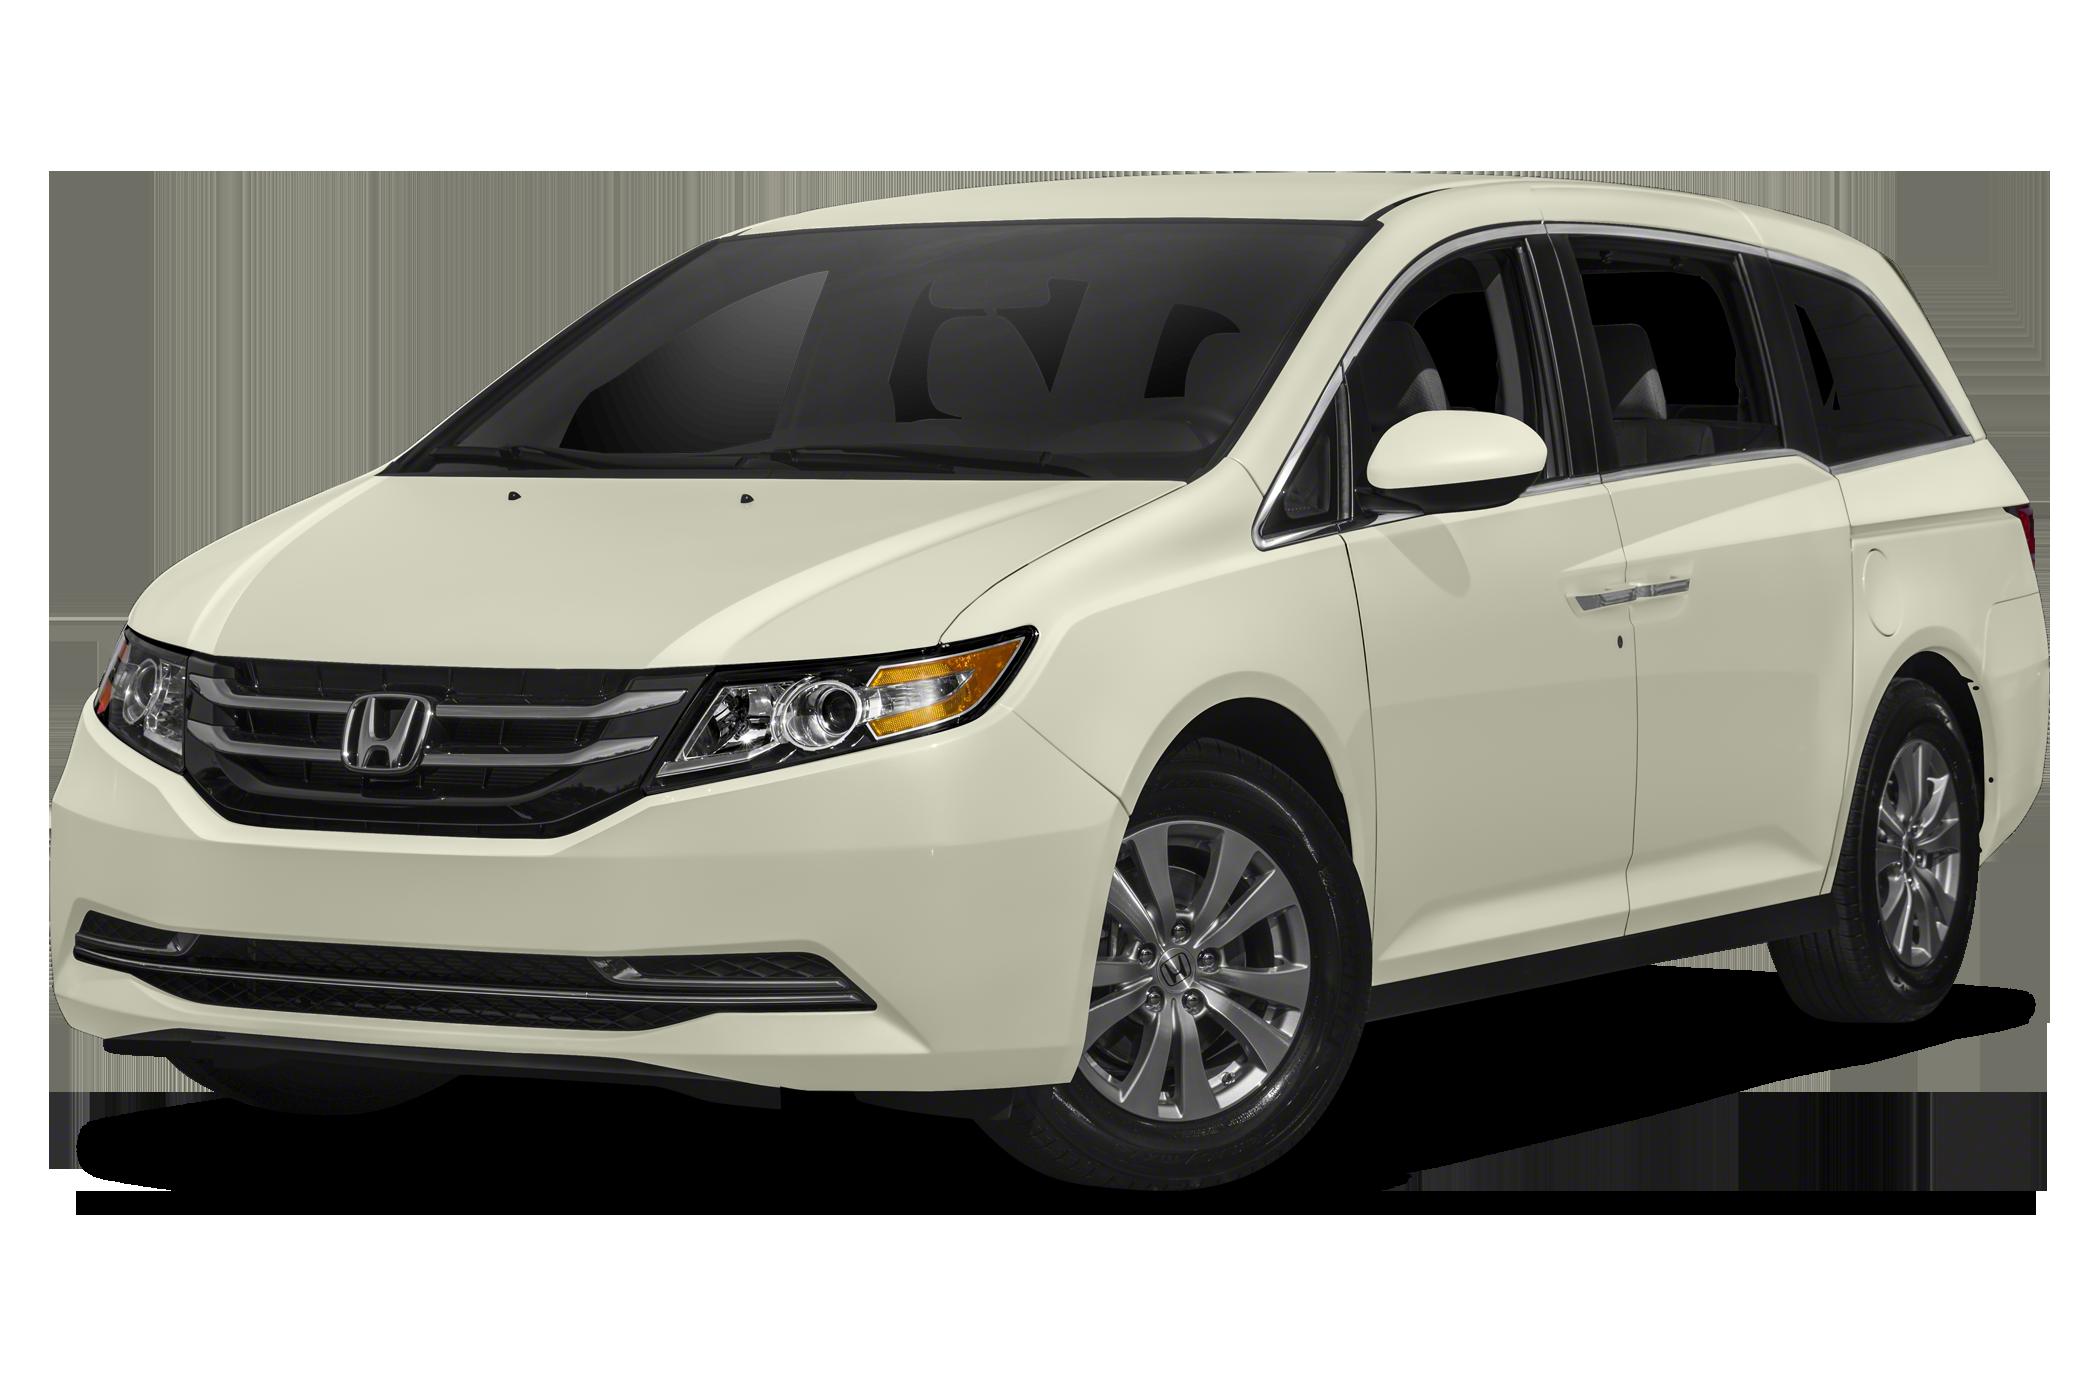 2017 Honda Odyssey SE Passenger Van